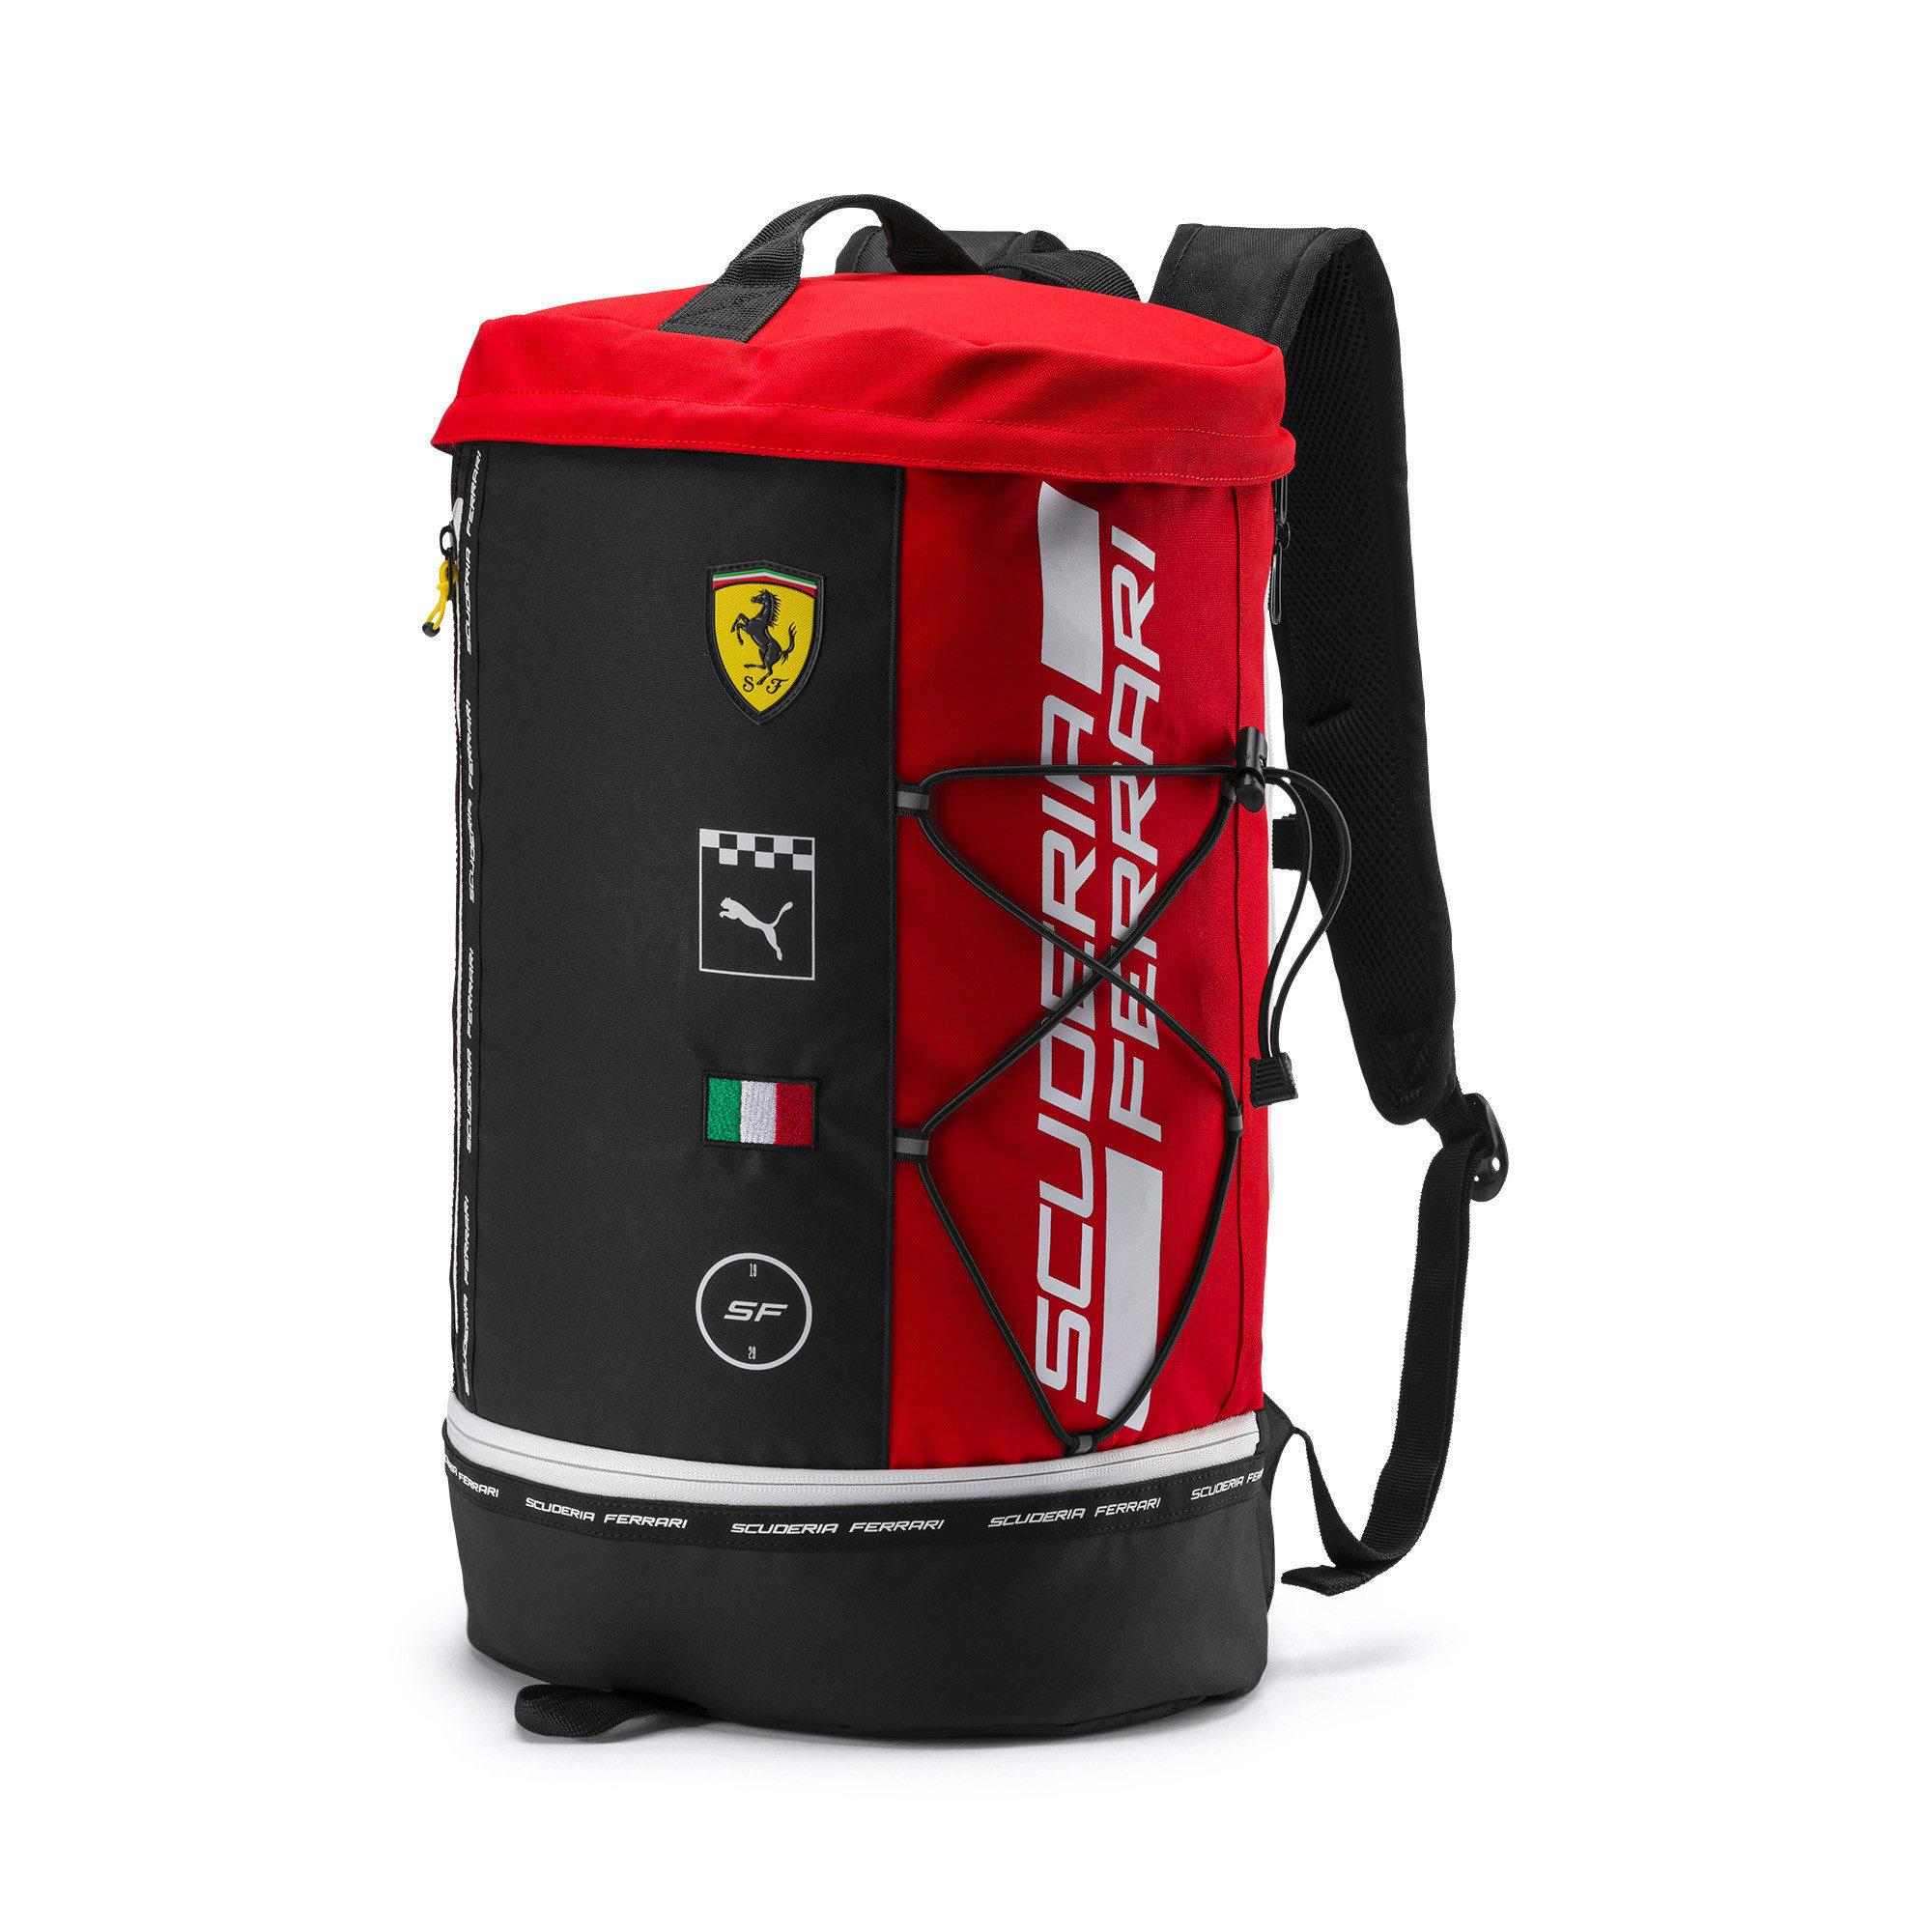 Thumbnail 1 of Ferrari Fanwear RCT Backpack, Rosso Corsa, medium-IND